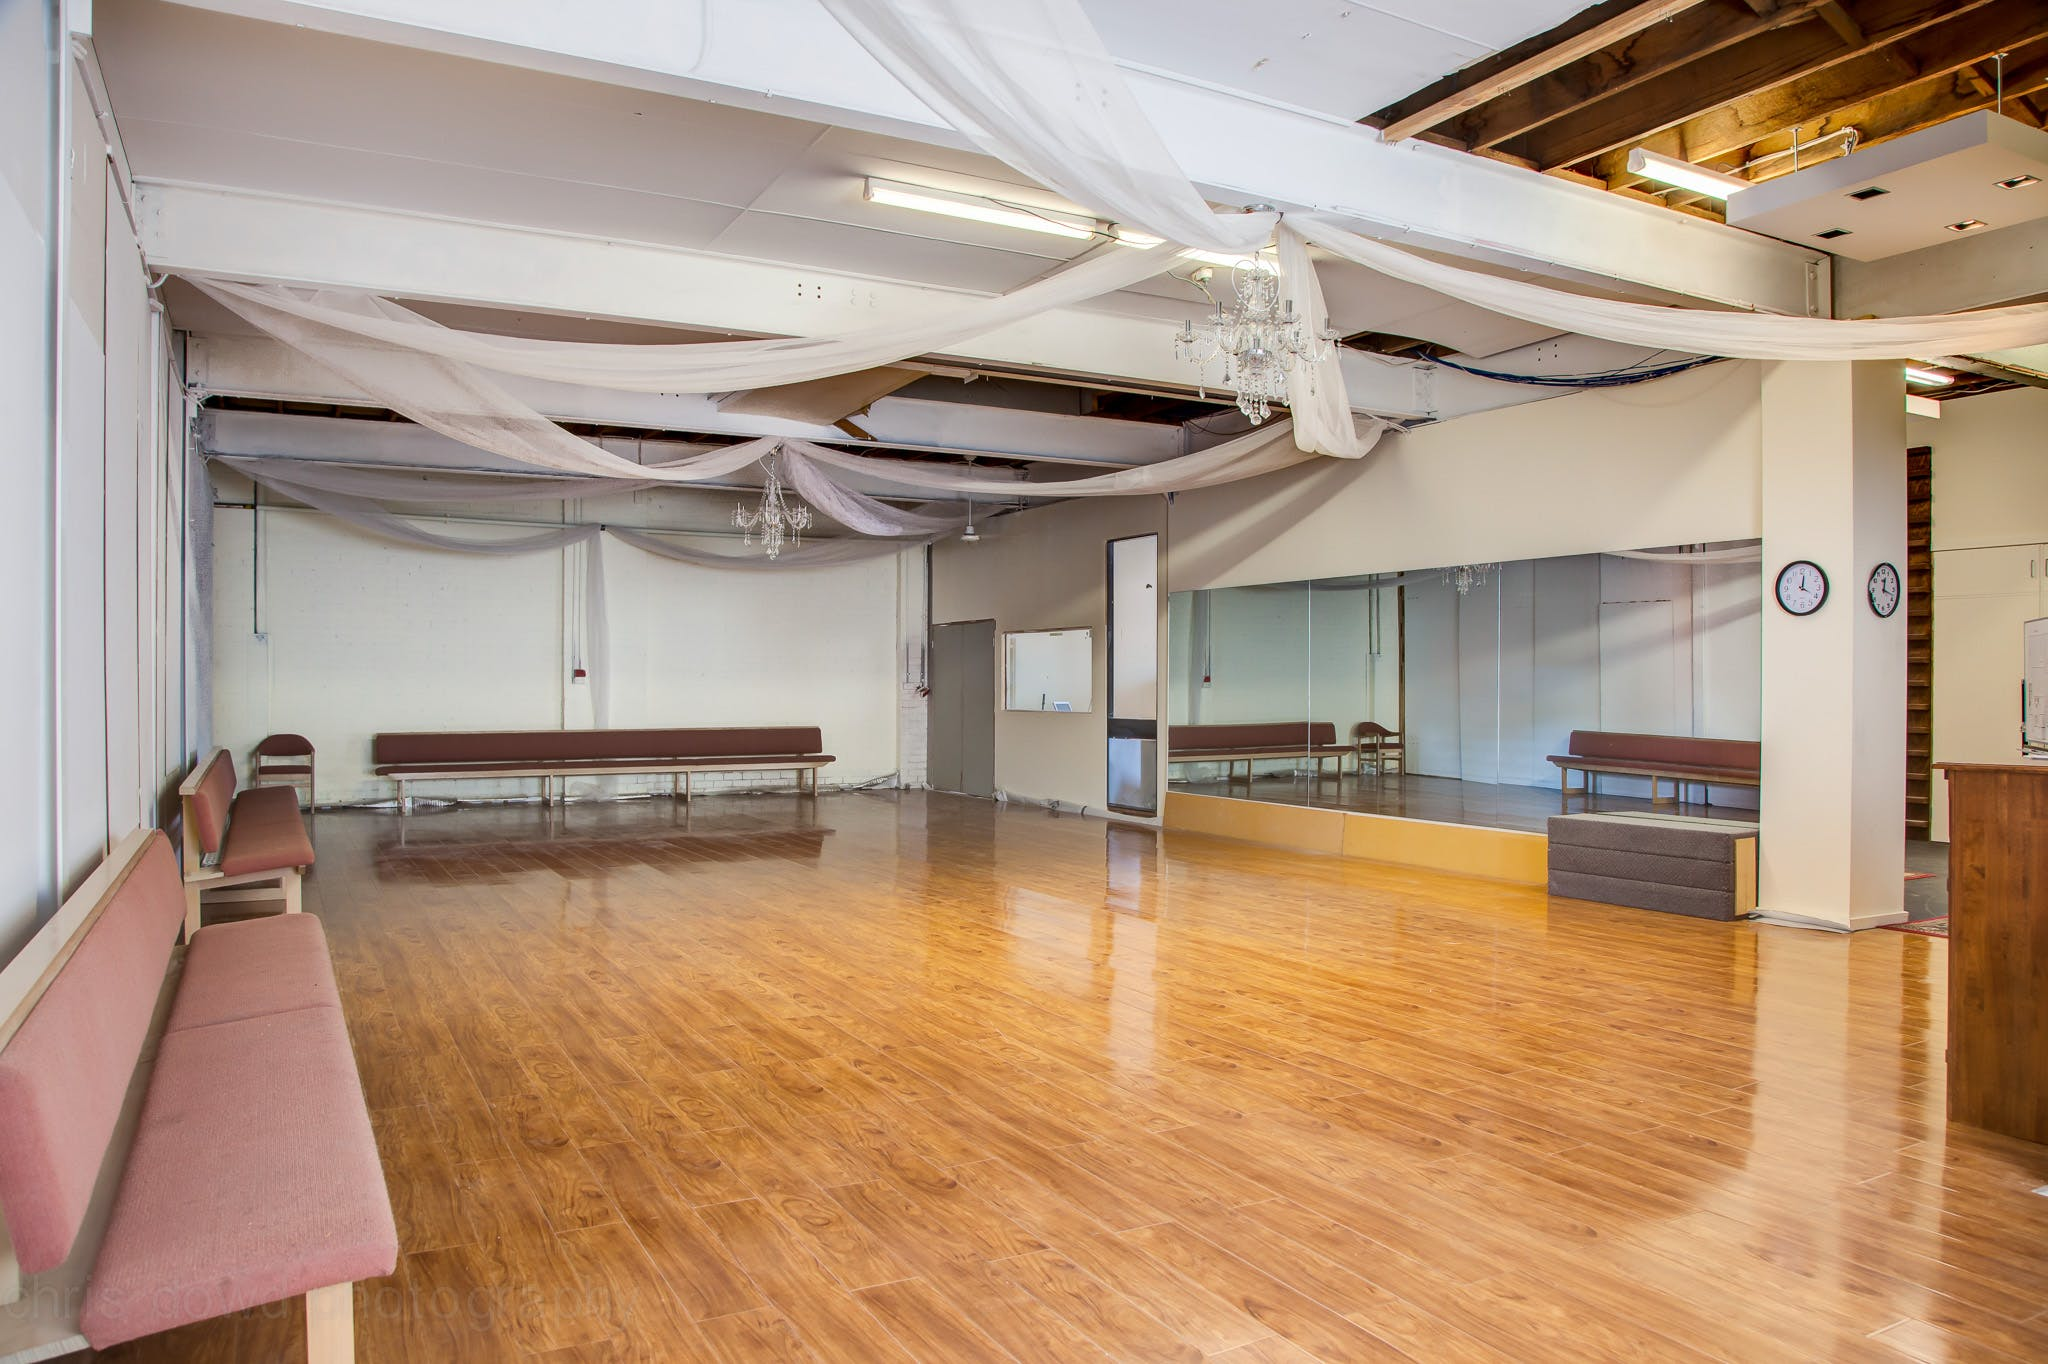 Studio 4, creative studio at Dance Be In It Centre, image 3